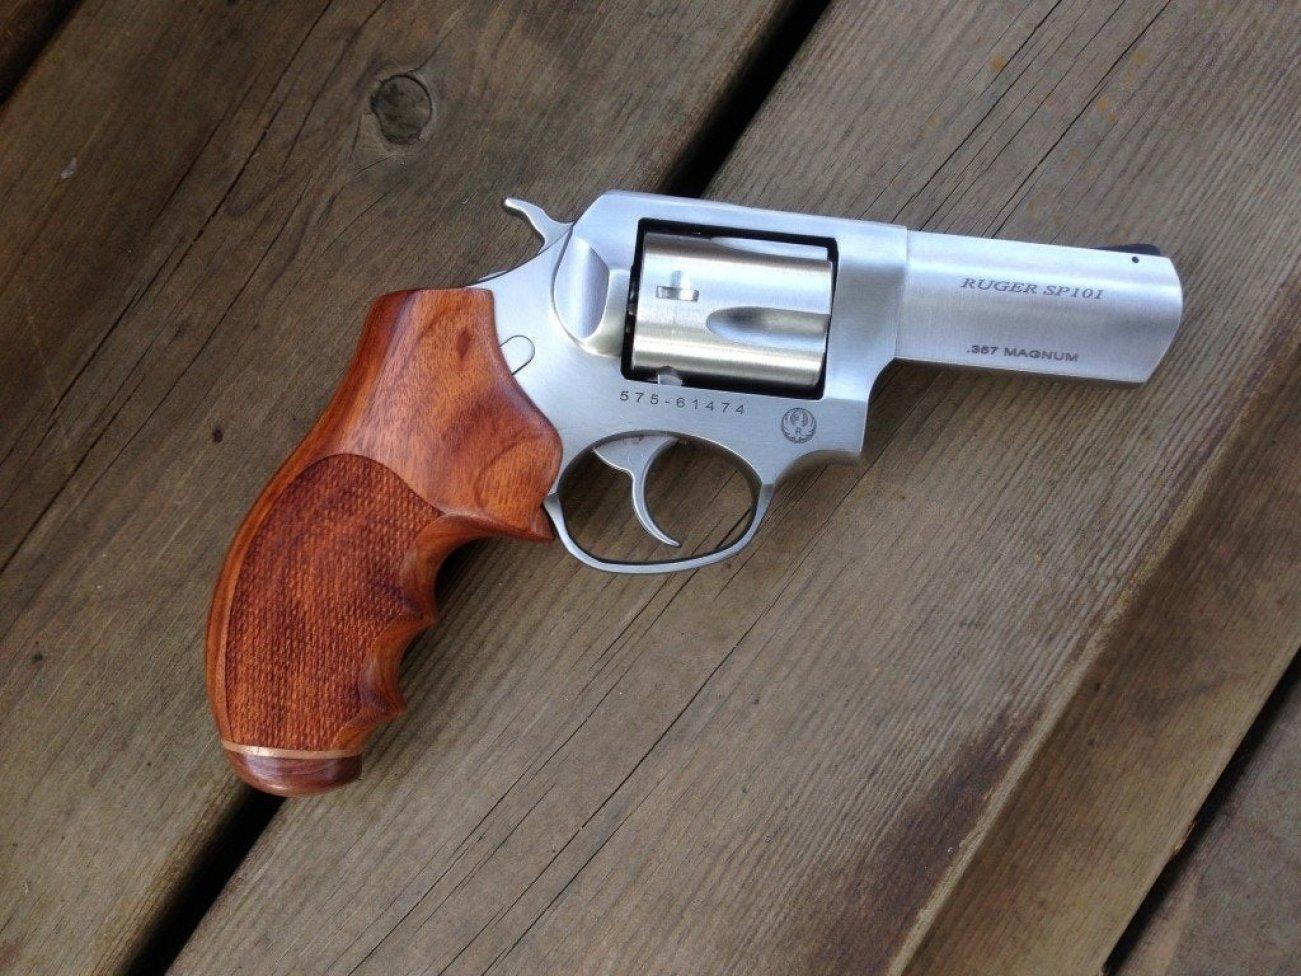 BANG: Five Best .38 Special Handguns for Home Defense